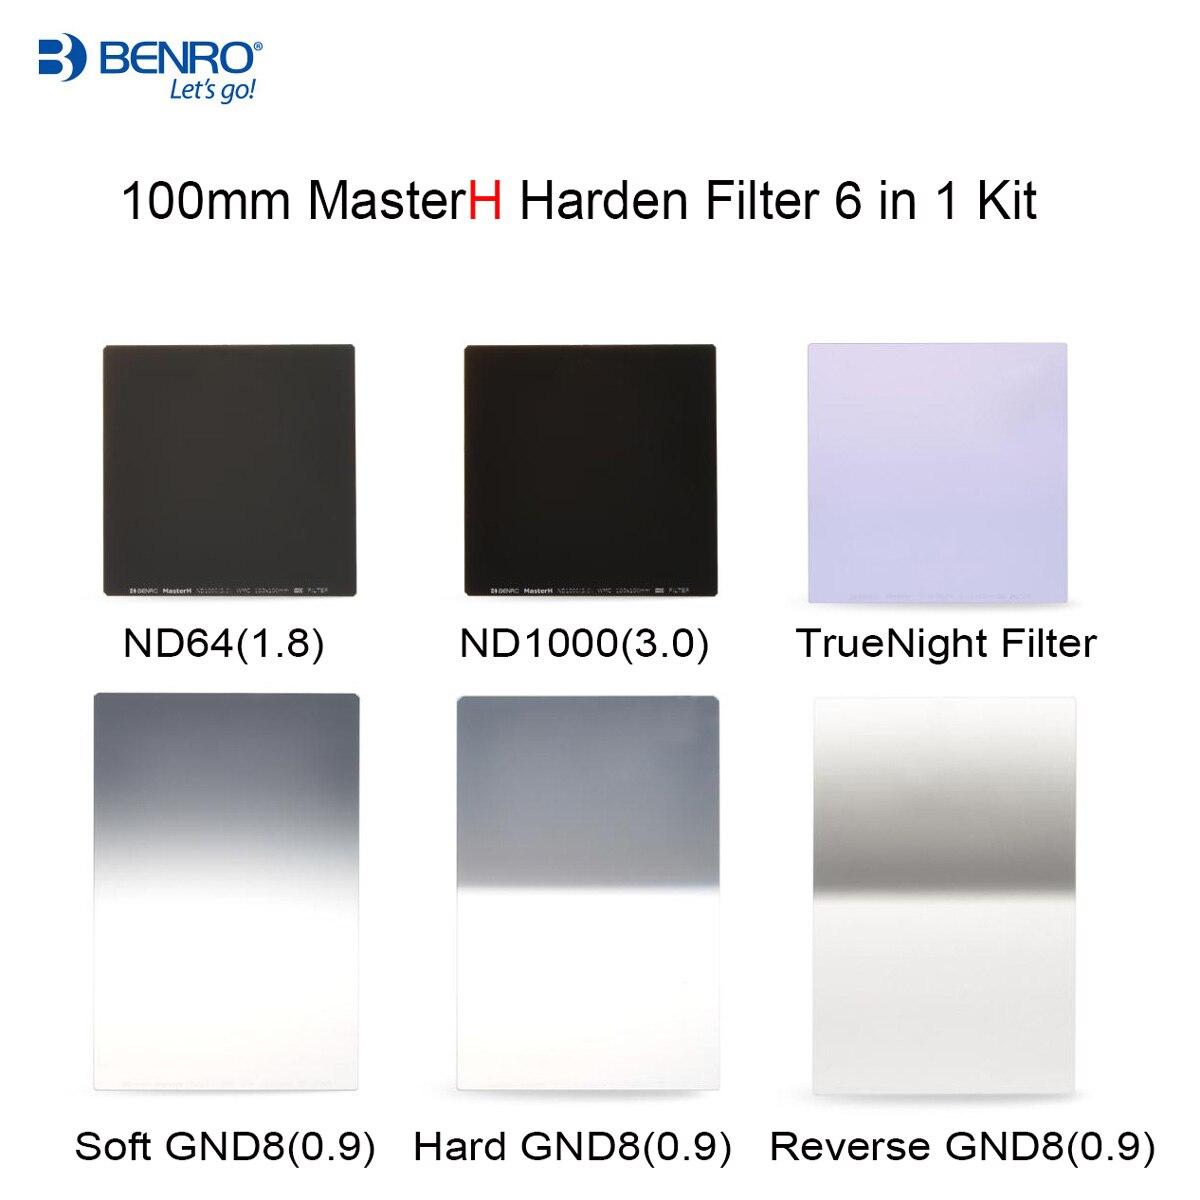 Benro MasterH 100mm series Harden Filter 6 in 1 kit ND1000 ND64 Soft GND8 Hard GND8